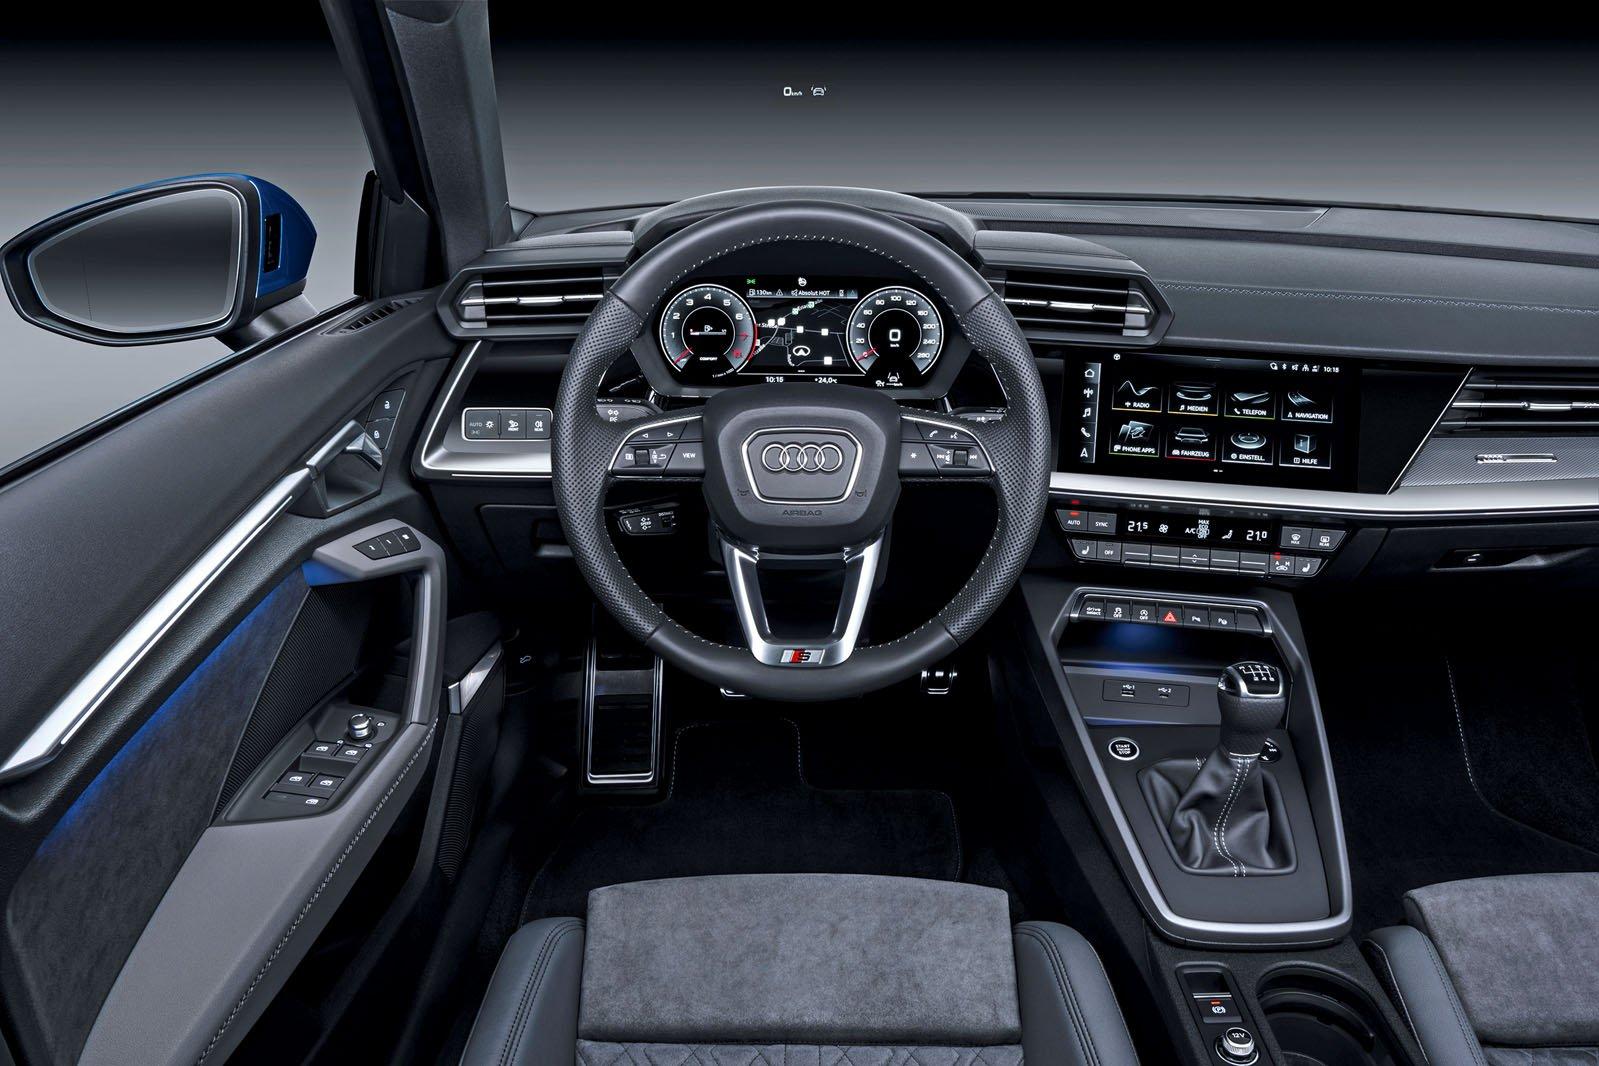 Audi A3 Sportback LHD dashboard